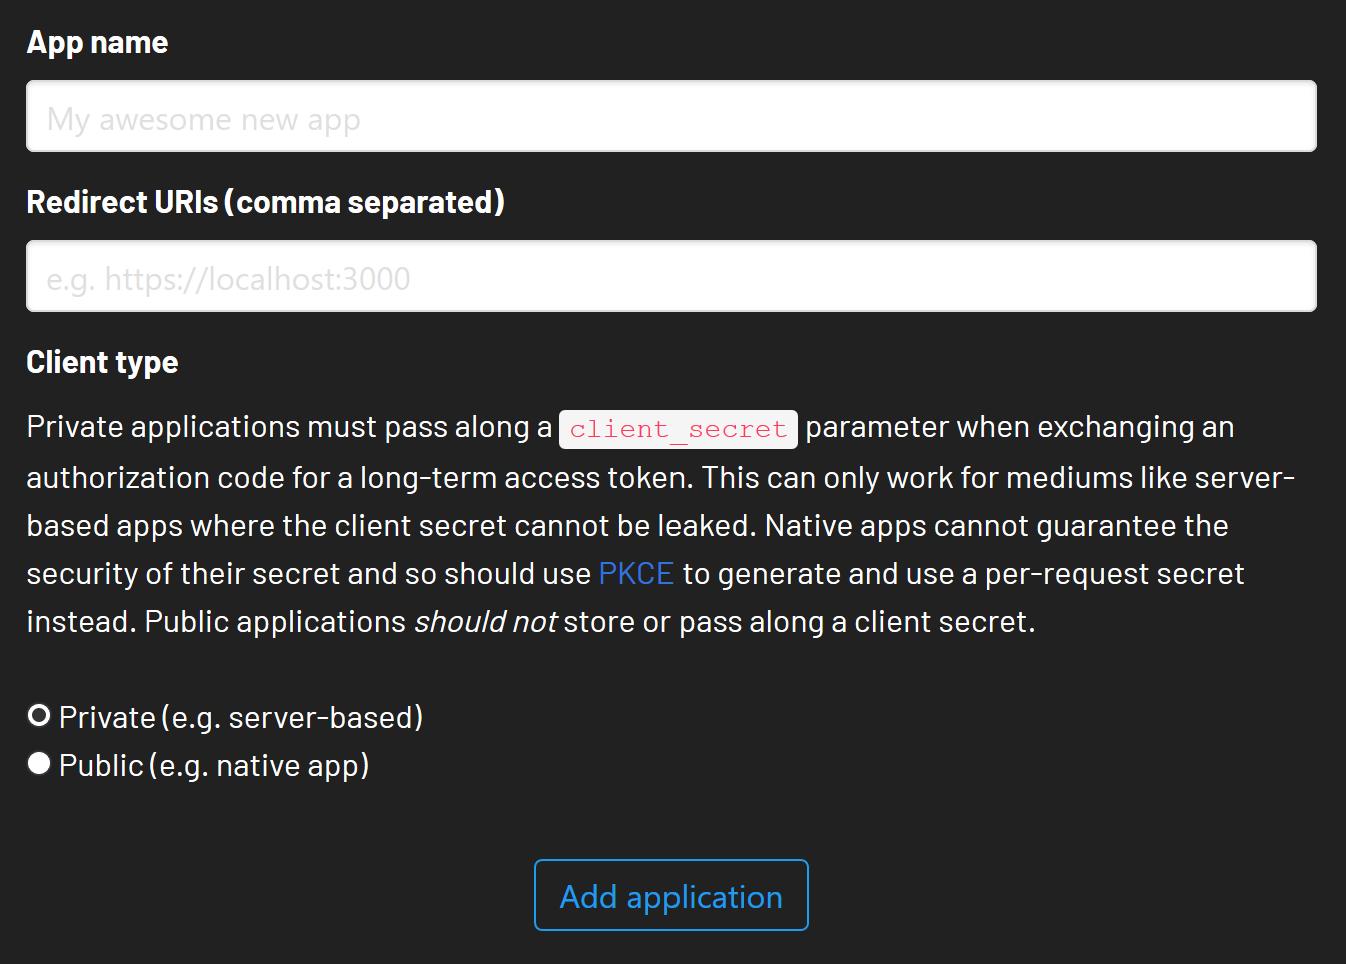 Add an OAuth application